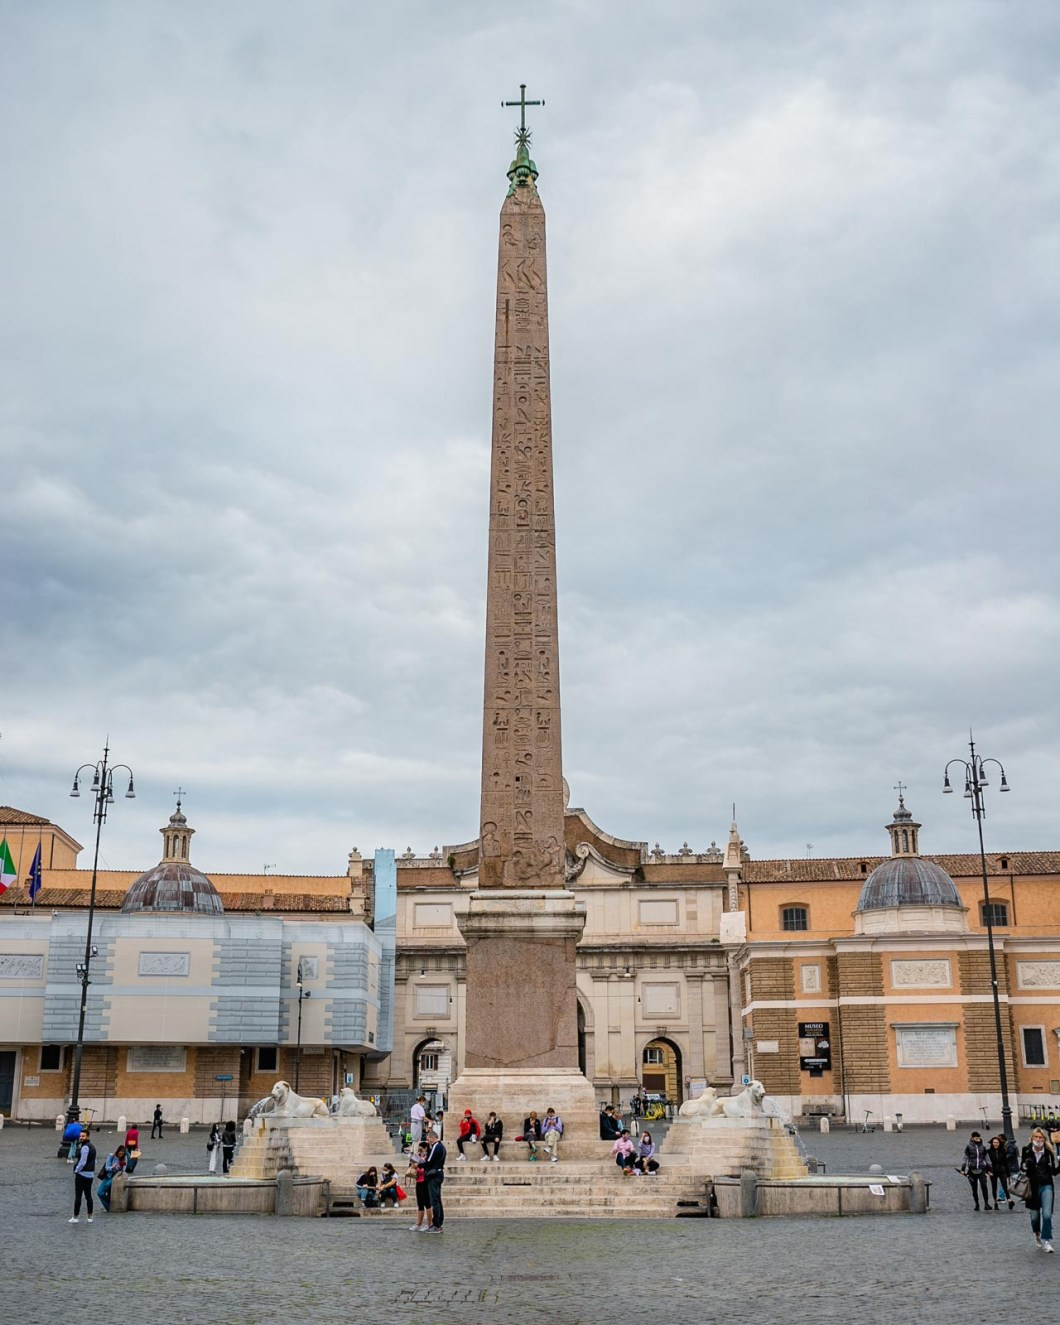 Egyptian Obelisk of Seti I and Ramesses II in Piazza del Popolo in Rome